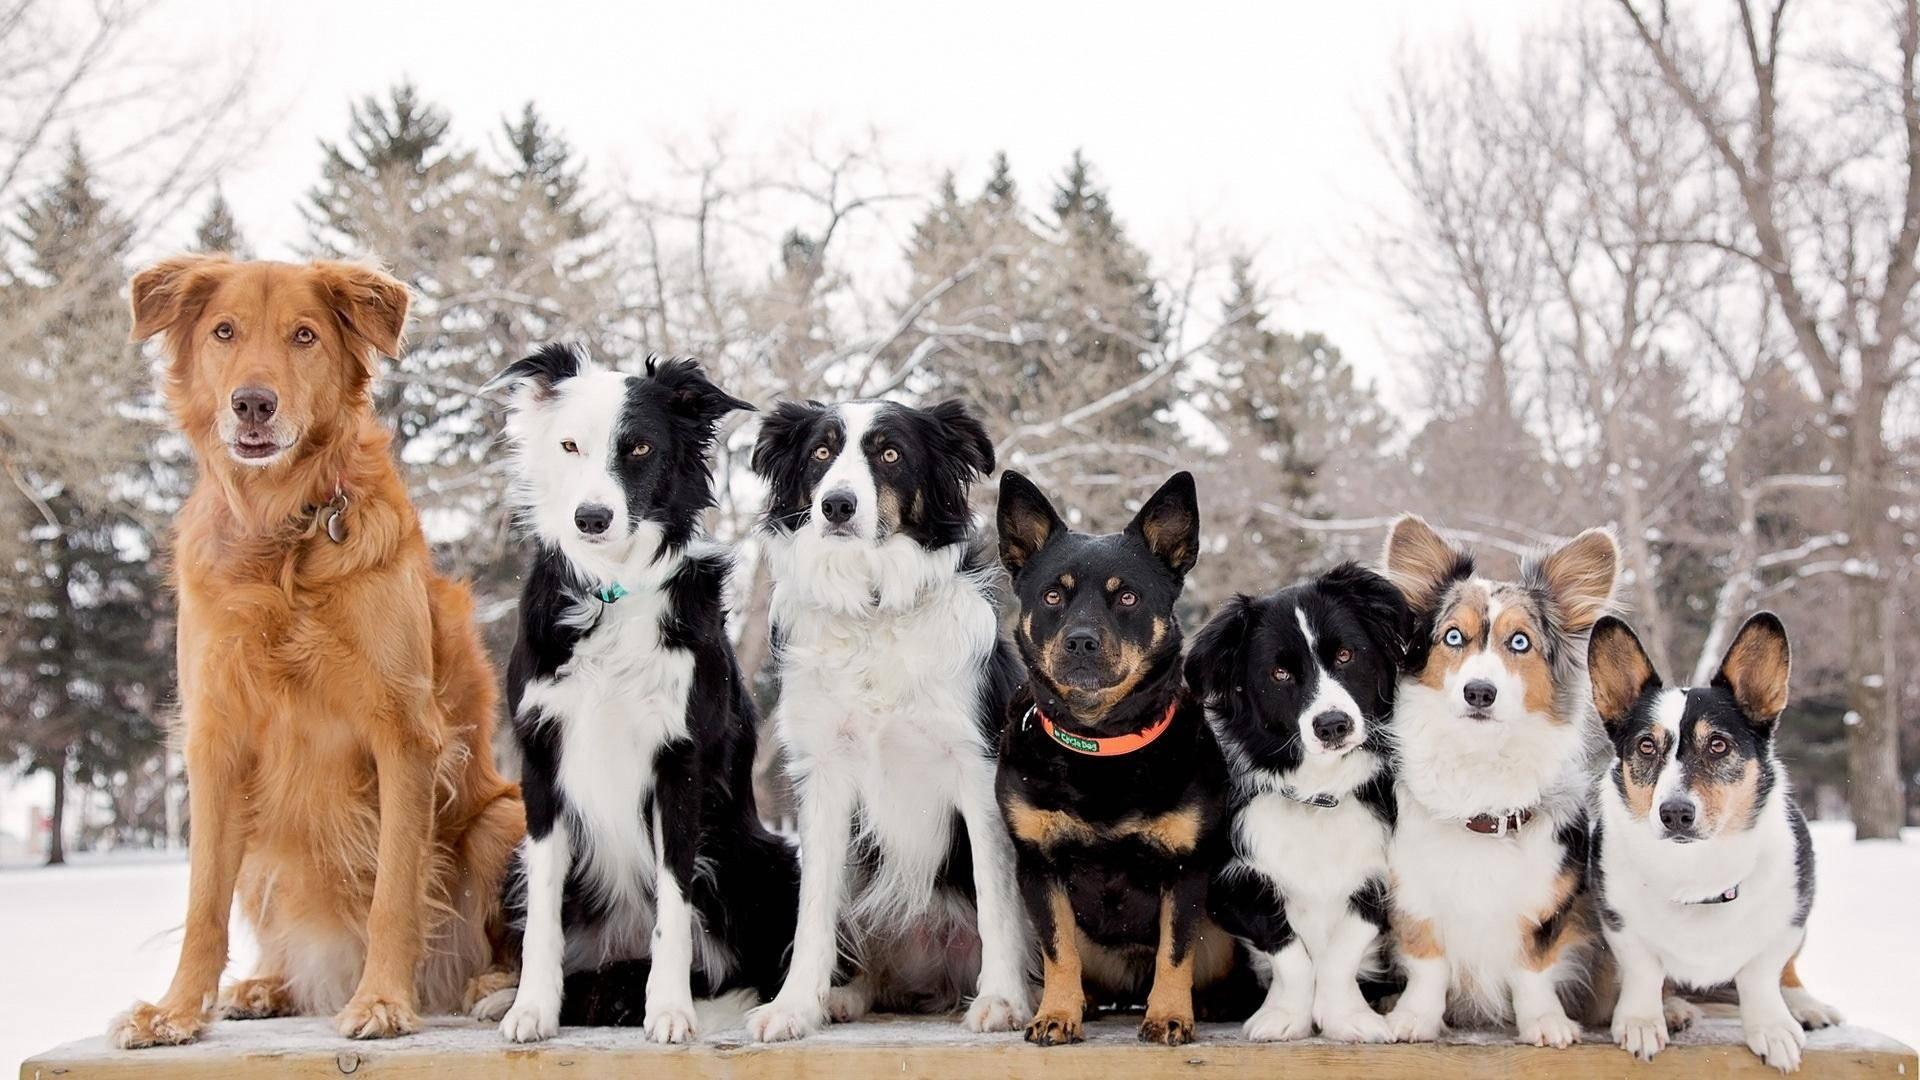 ᐉ ханаанская собака описание породы - zoomanji.ru